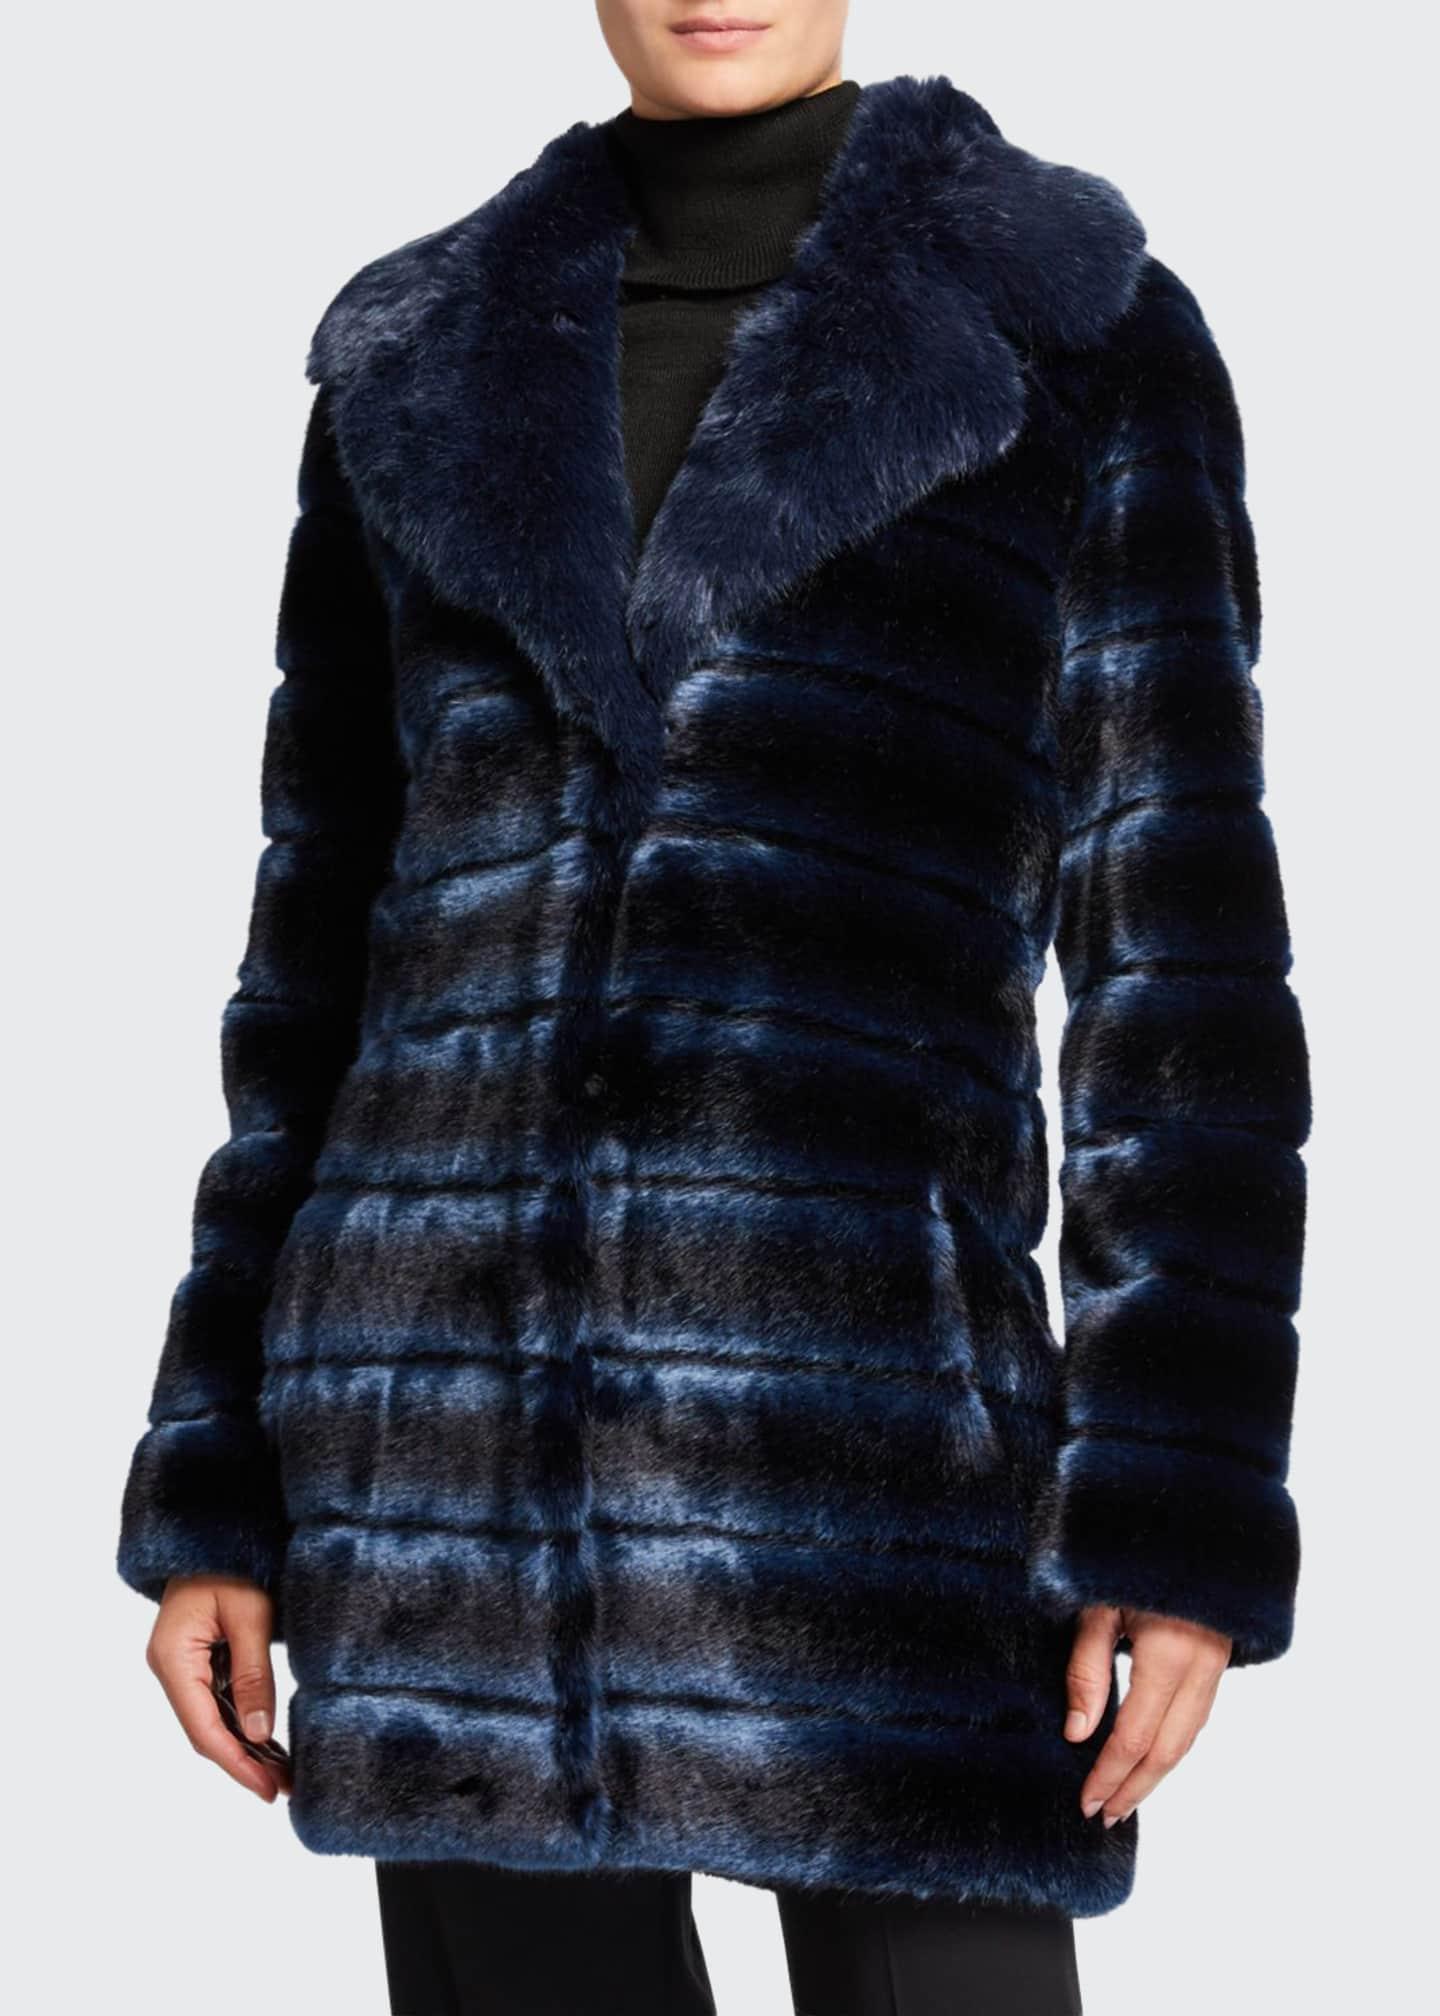 Faz Not Fur Swagger Faux-Fur Coat